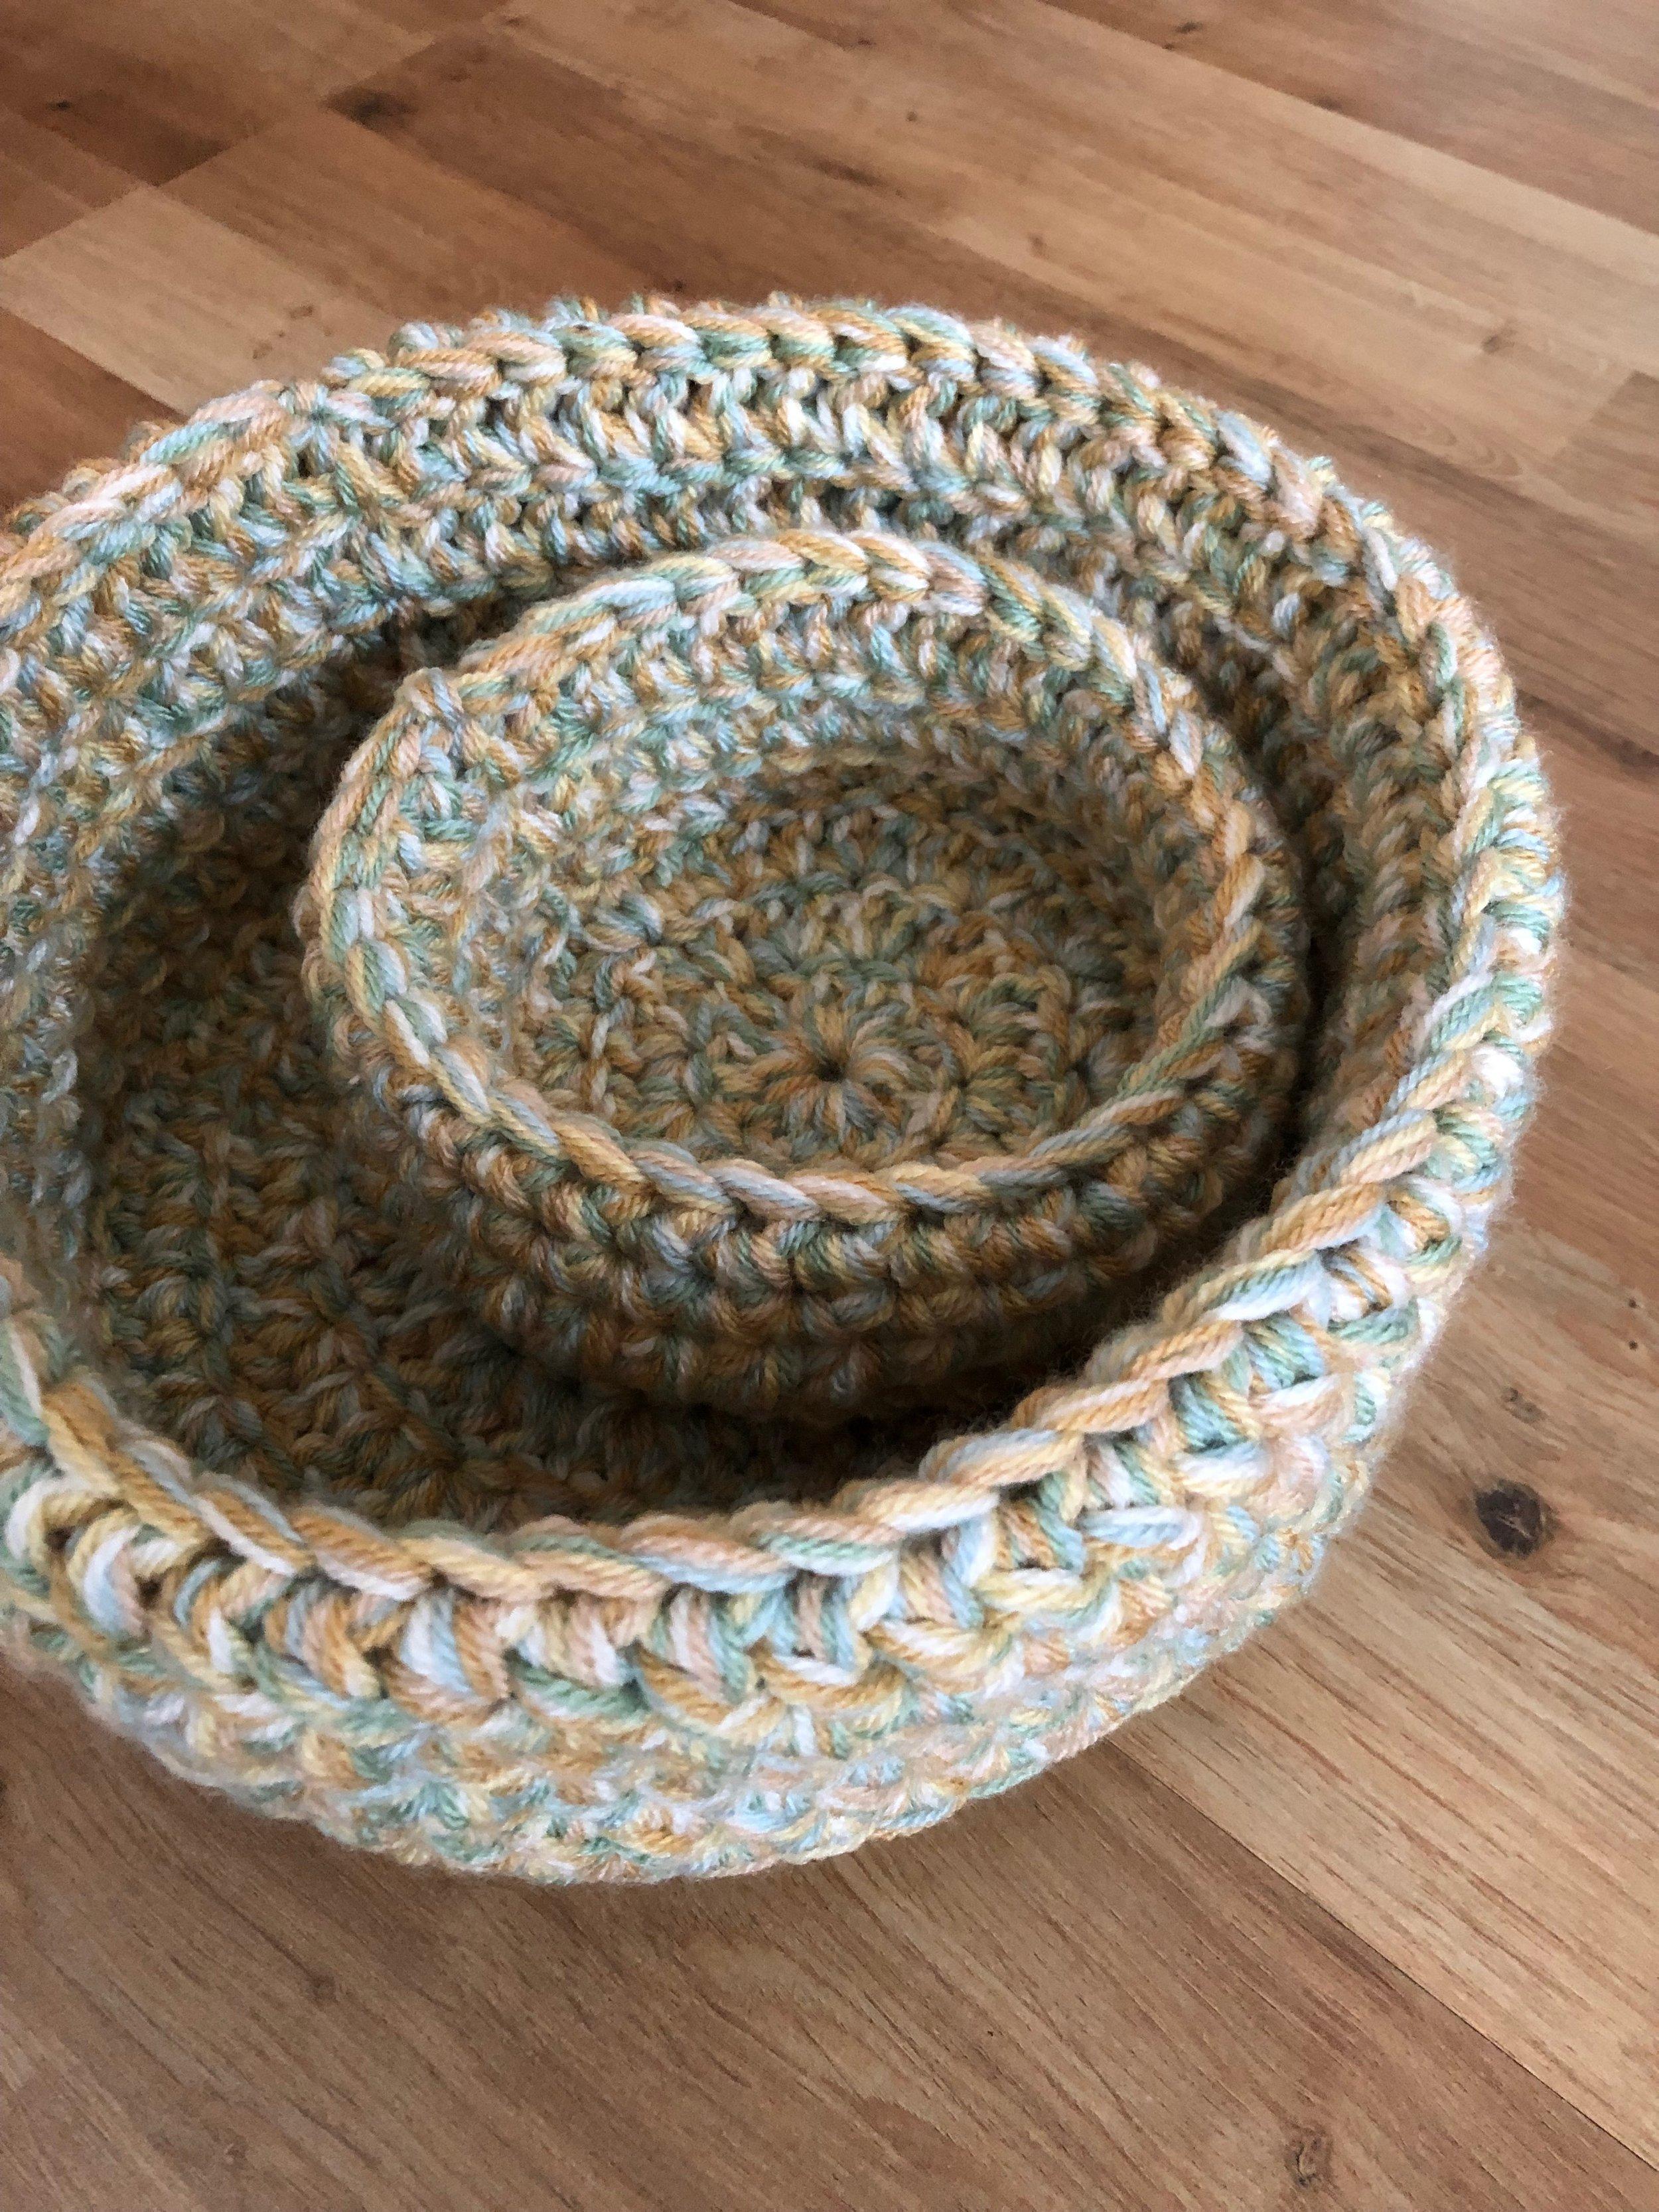 Crochet chunky baskets